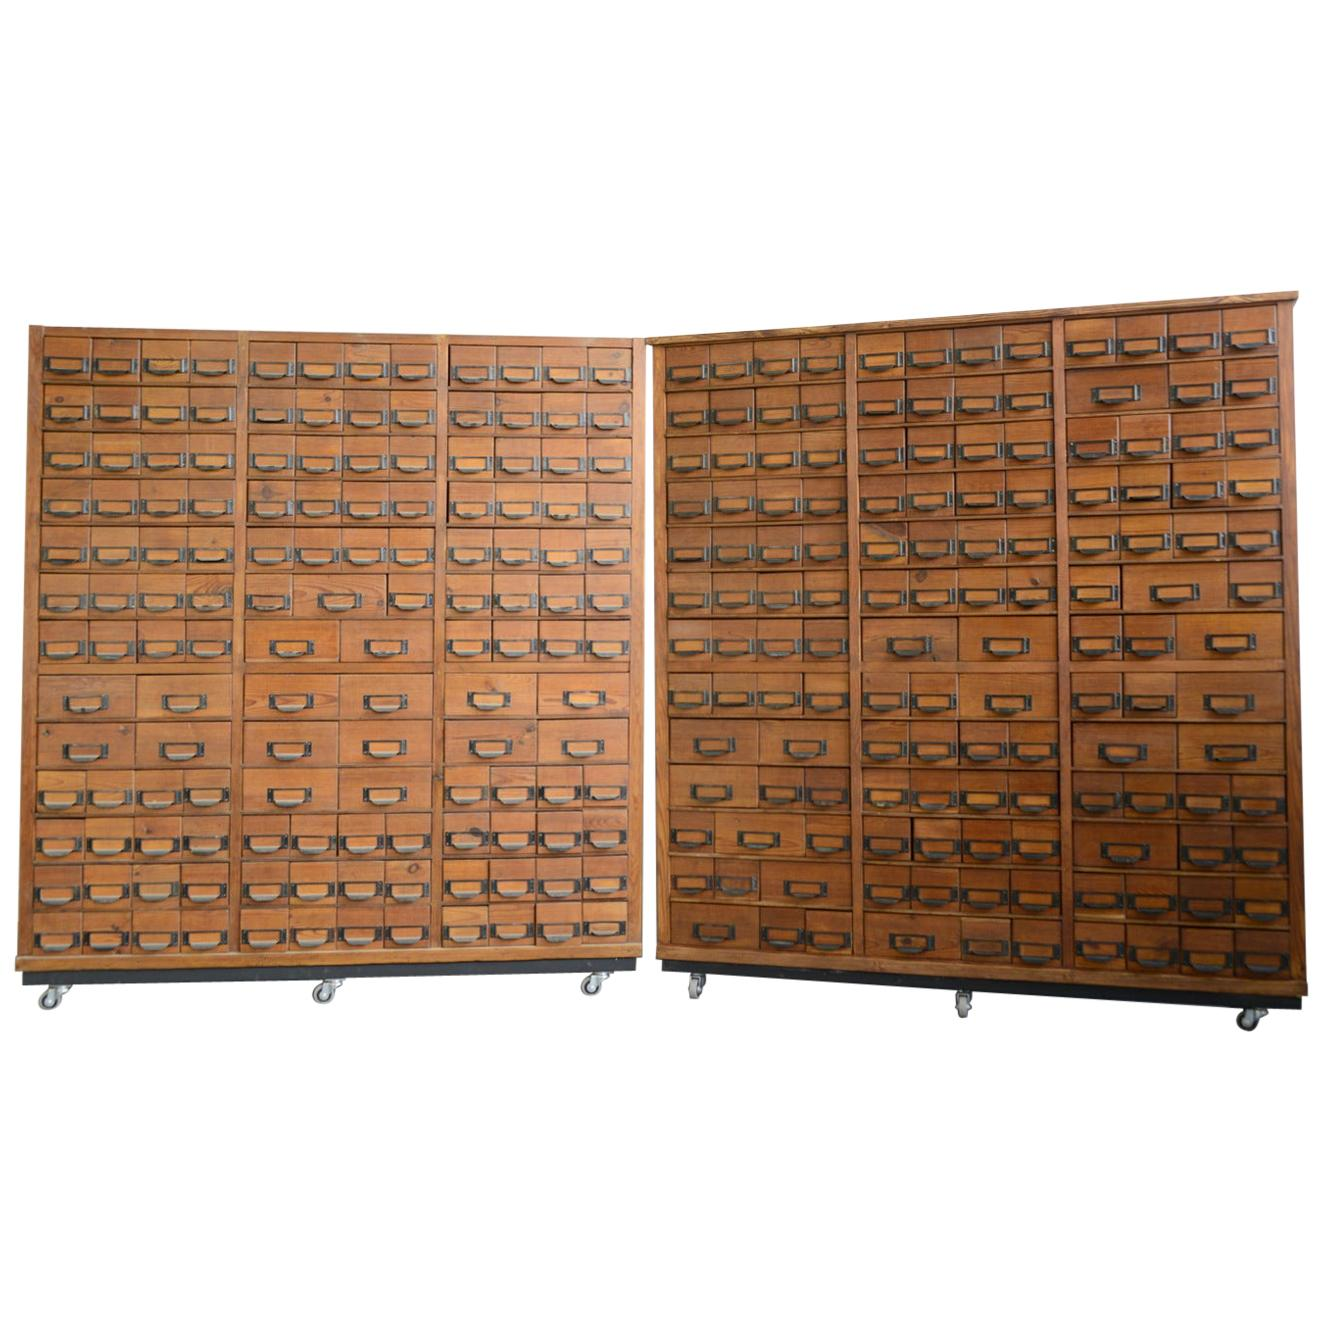 Wooden Dental Surgery Record Cabinets, circa 1950s